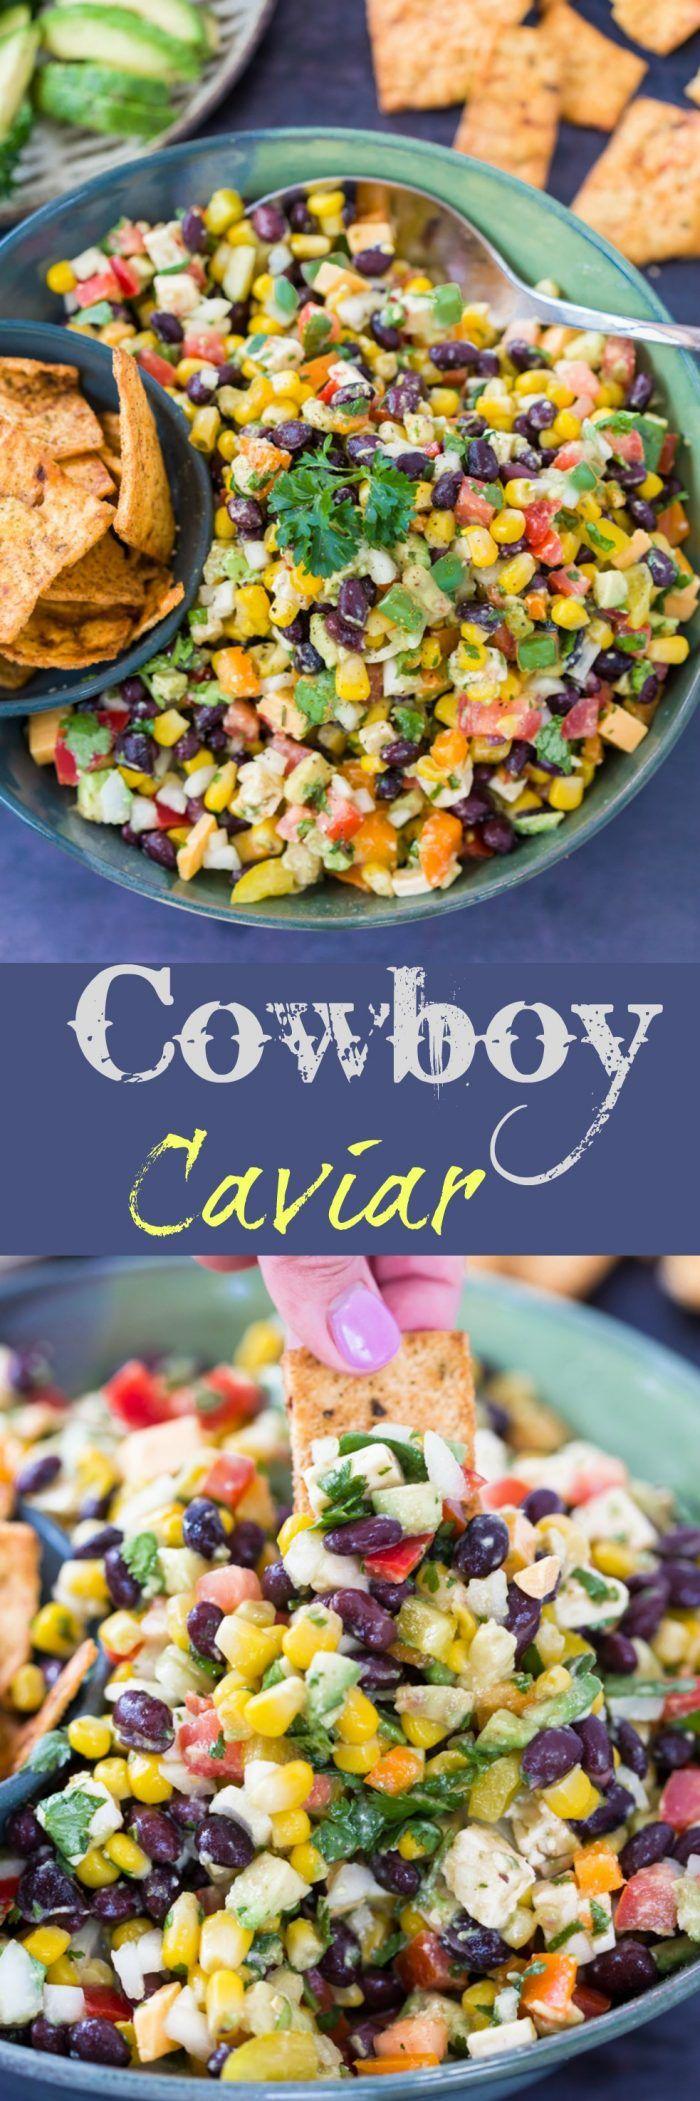 Cowboy Caviar - The Cozy Cook